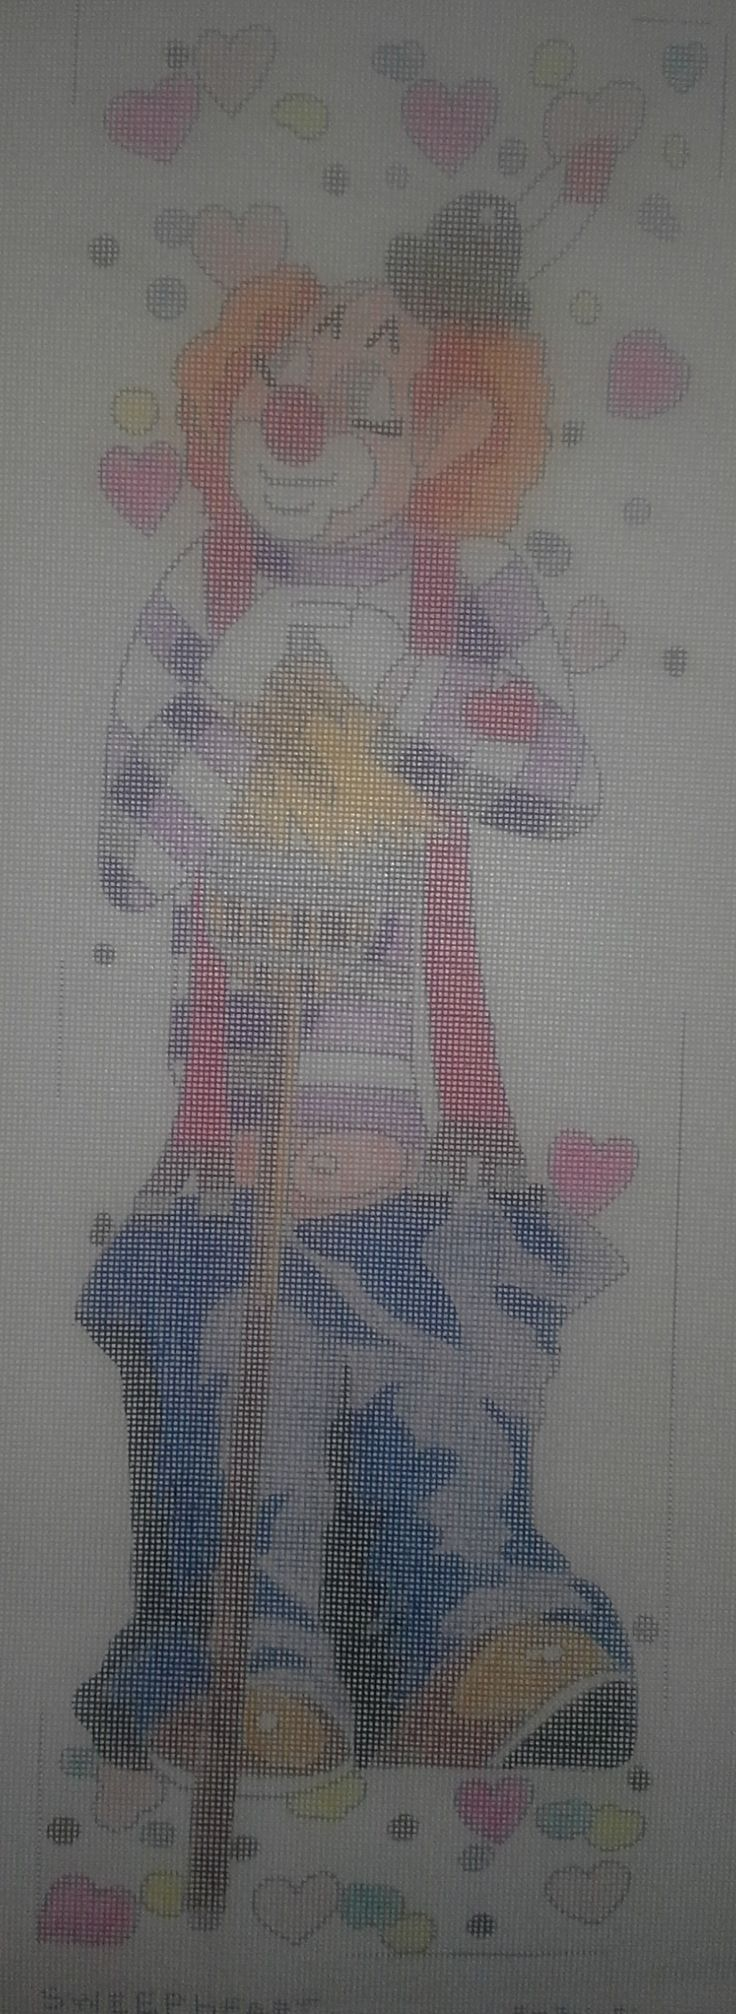 Sasi Creations Inc. Sweepheart 3034 1T Needlepoint Canvas